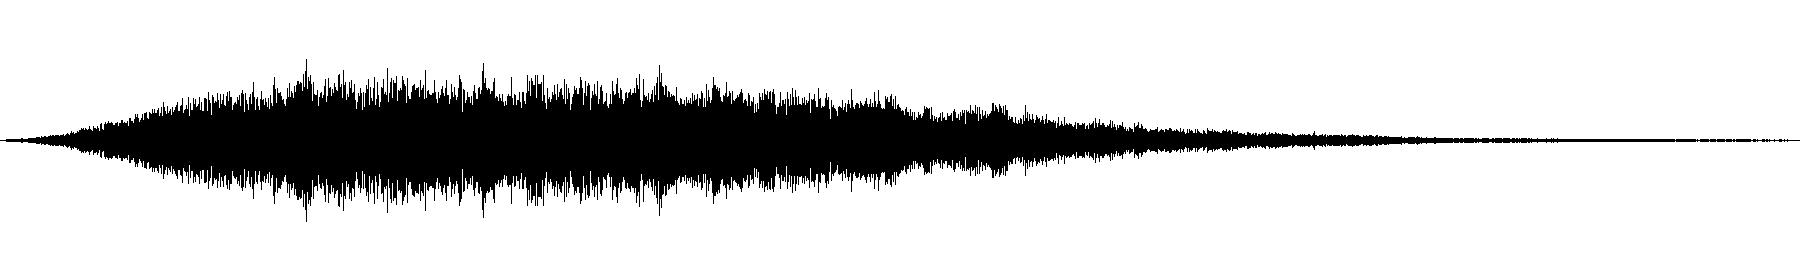 synth choir f7